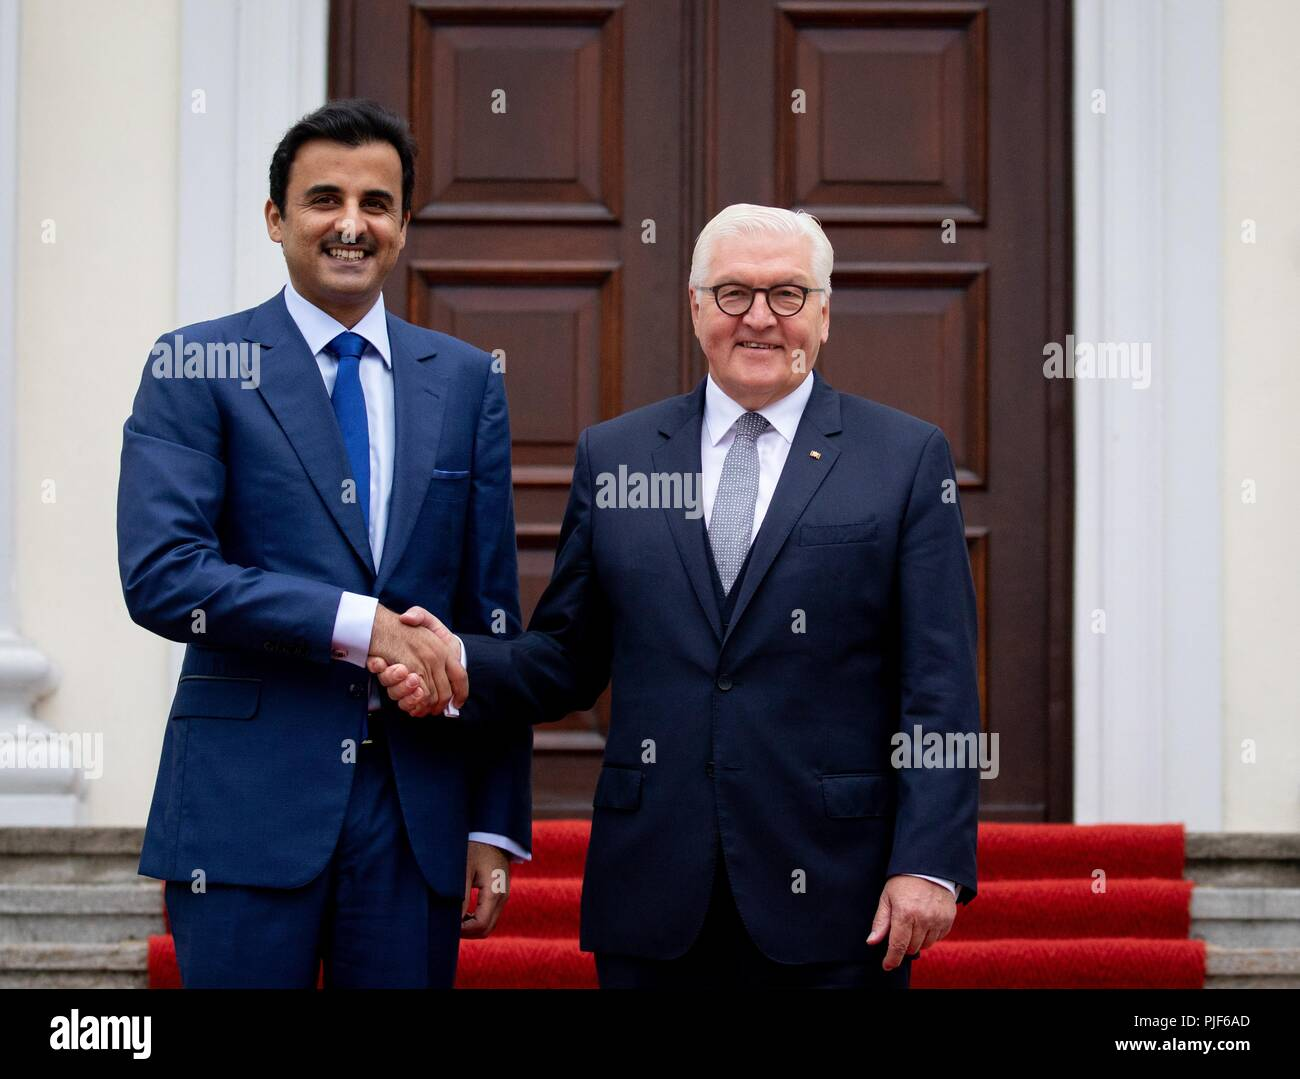 Berlin, Germany. 07th Sep, 2018. 07.09.2018, Berlin: Federal President Frank-Walter Steinmeier (r) receives the Emir of Qatar, Sheikh Tamim bin Hamad Al-Thani in front of Bellevue Castle. Credit: Kay Nietfeld/dpa/Alamy Live News - Stock Image